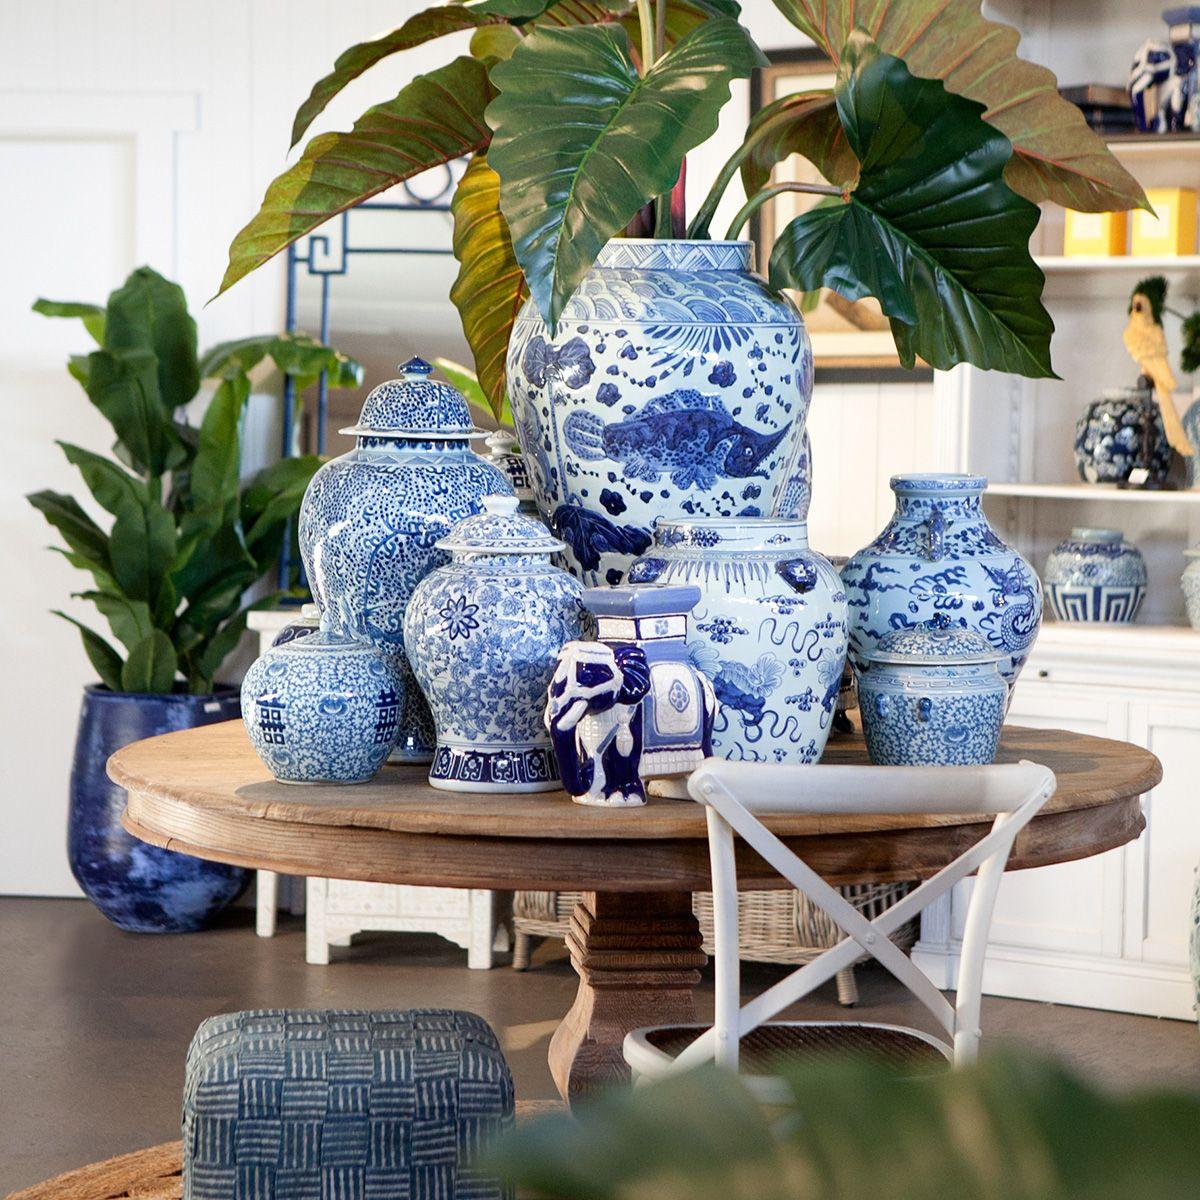 Blue and White Ginger Jar inspiration